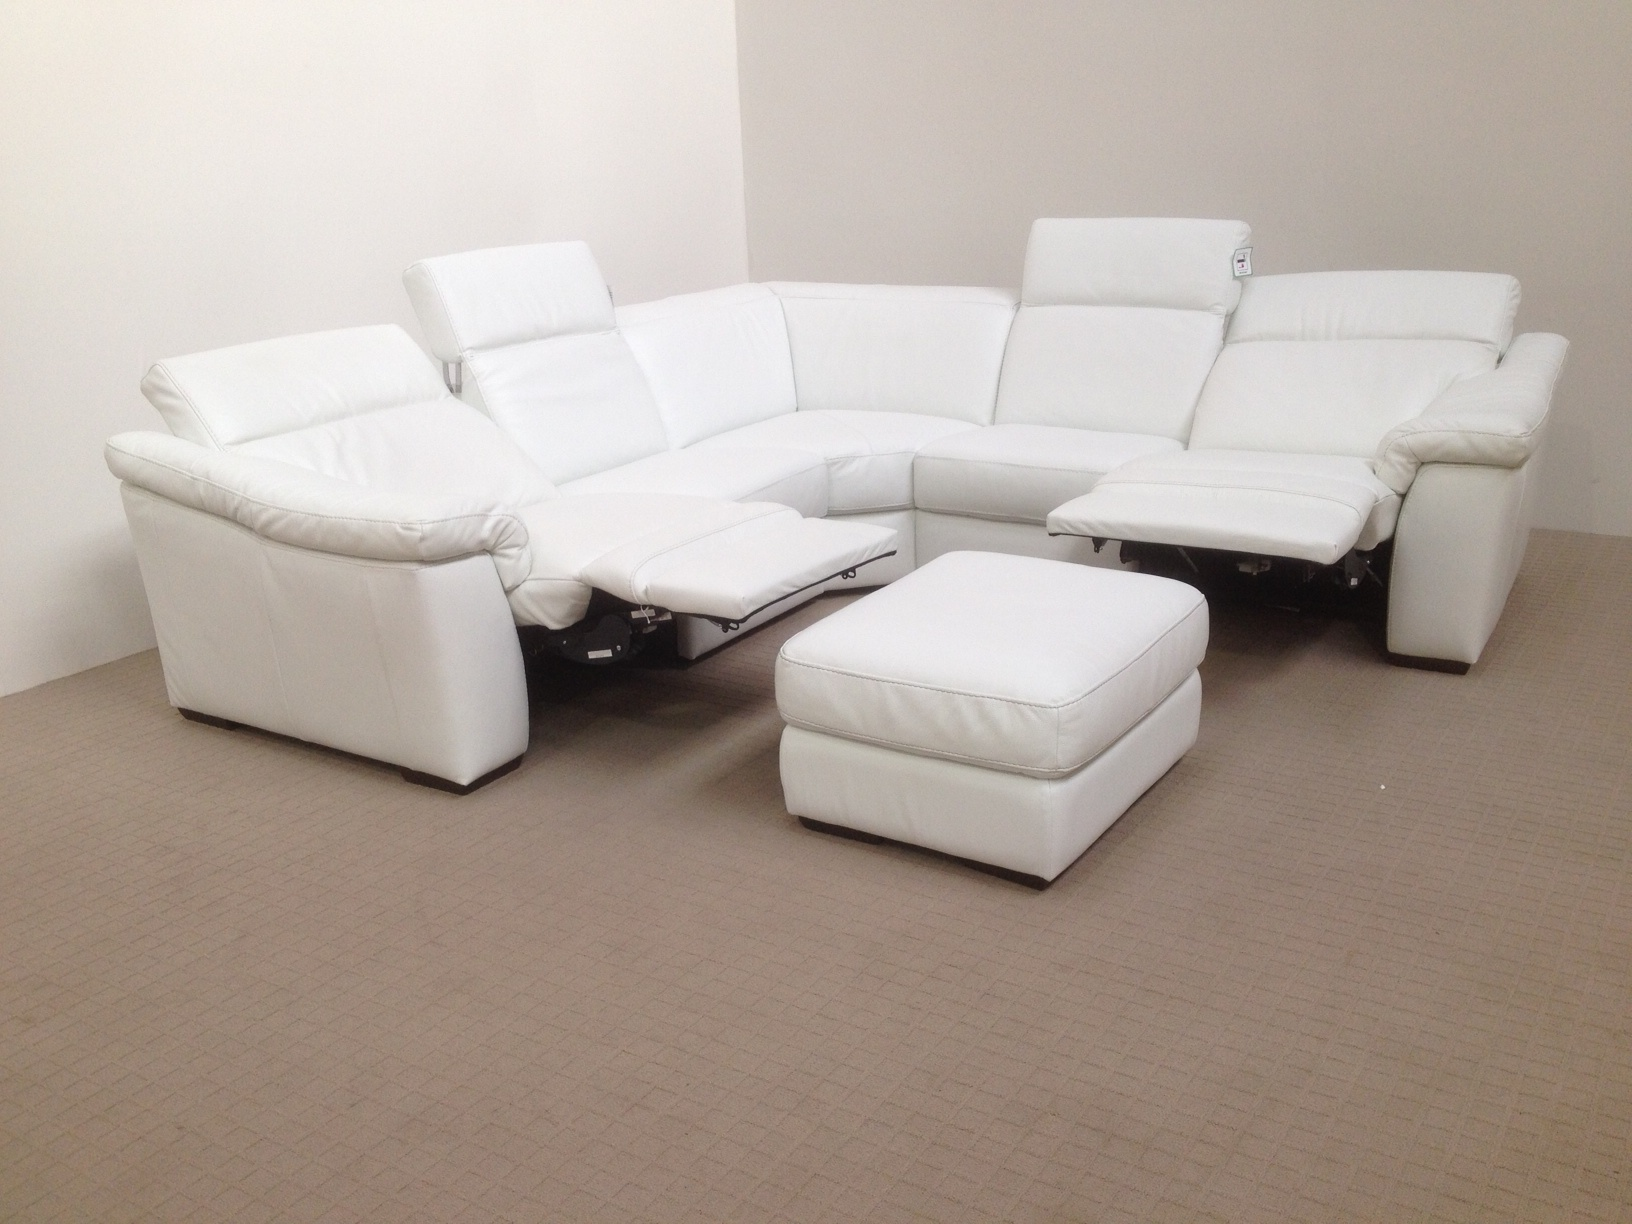 natuzzi electric recliner sofa bloomingdales slipcovers edition sensor b760 reclining corner